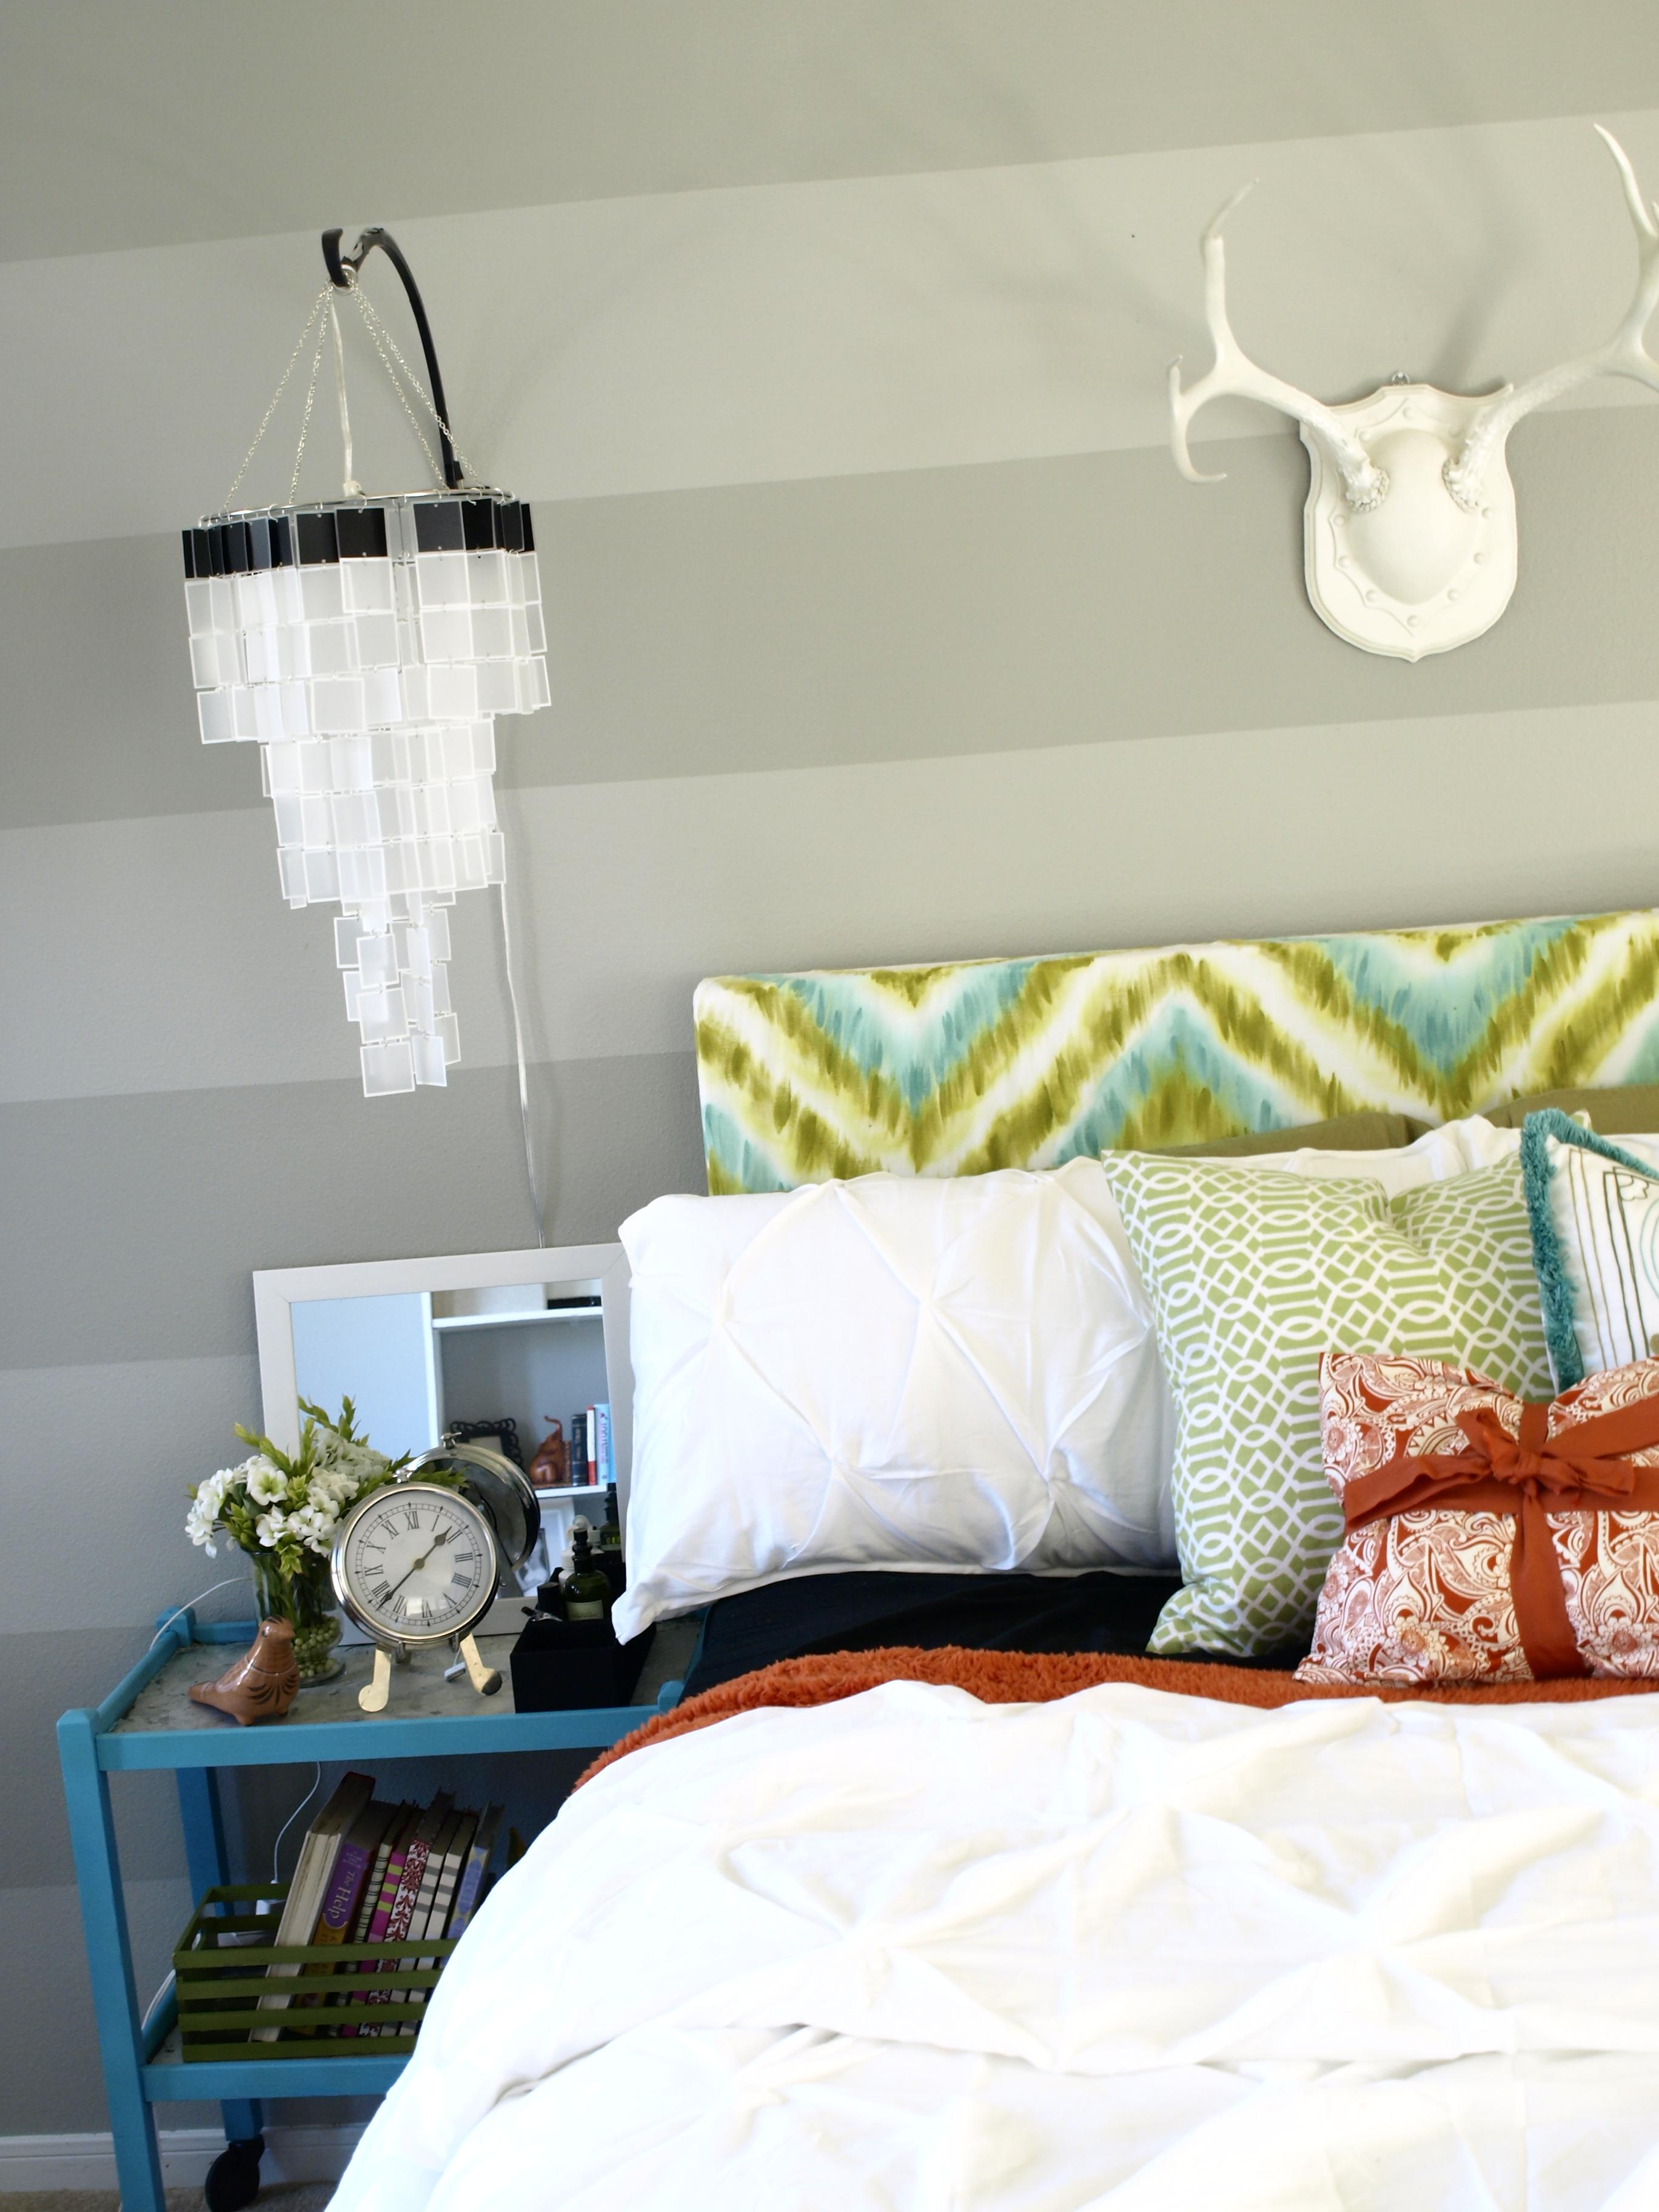 Painted Headboard Ideas diy chevron headboard | hand-painted upholstered headboard